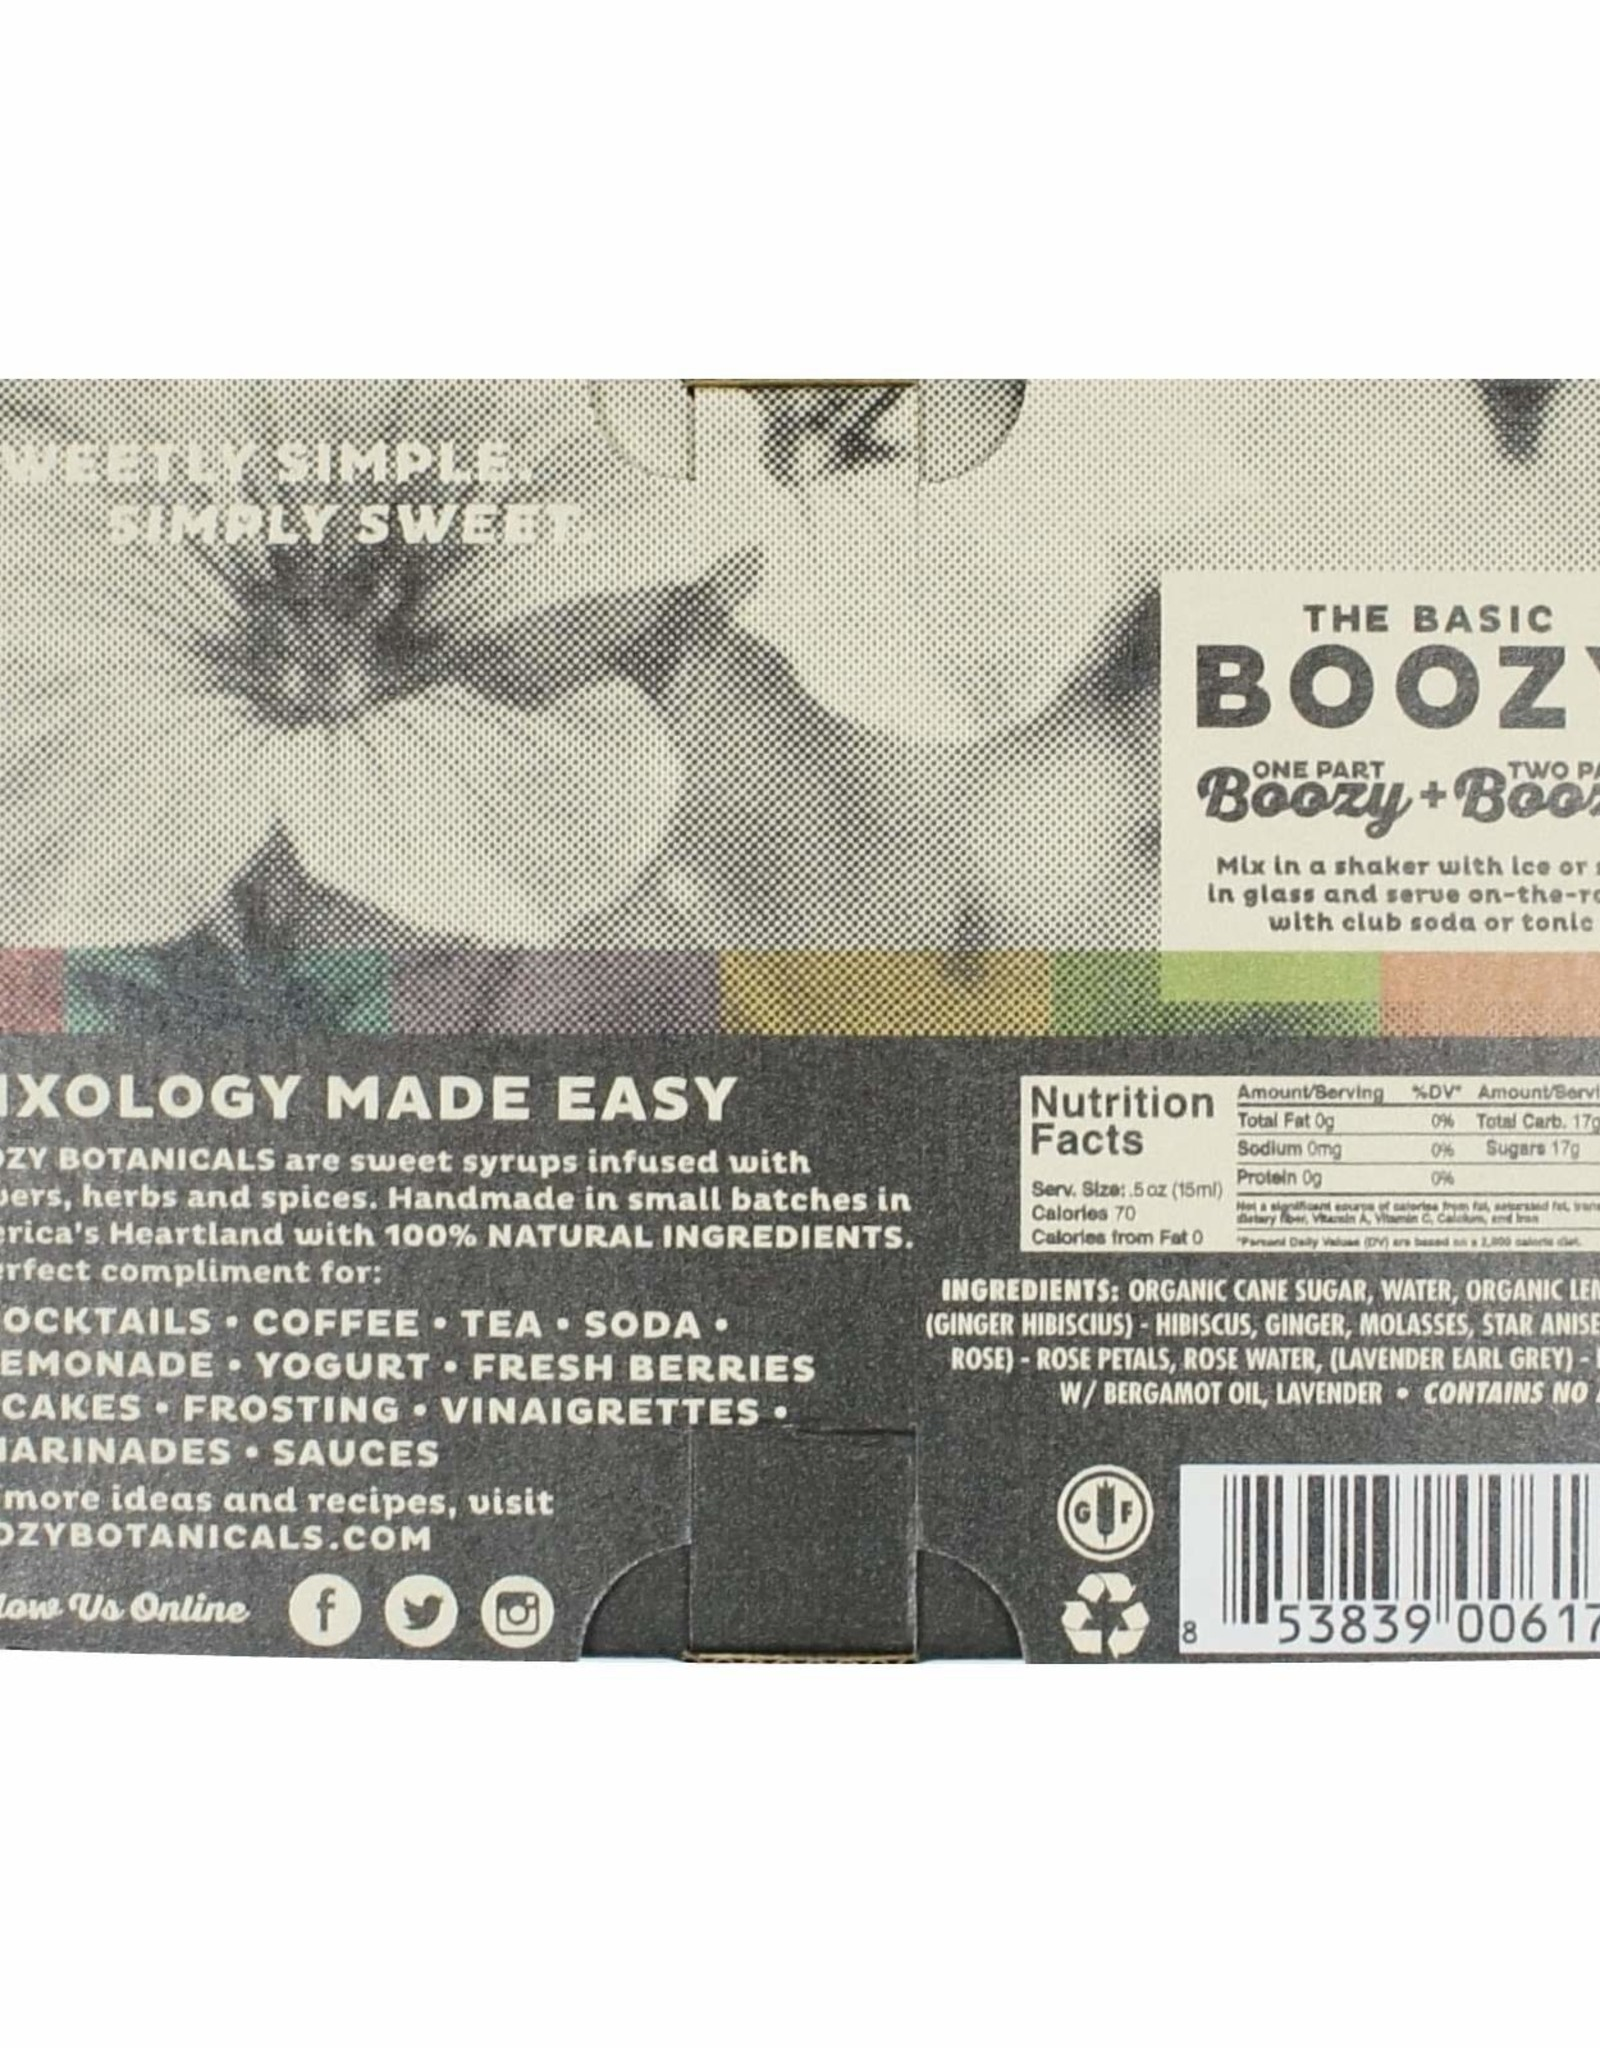 boozy botanicals Boozy Botanicals Sample Box